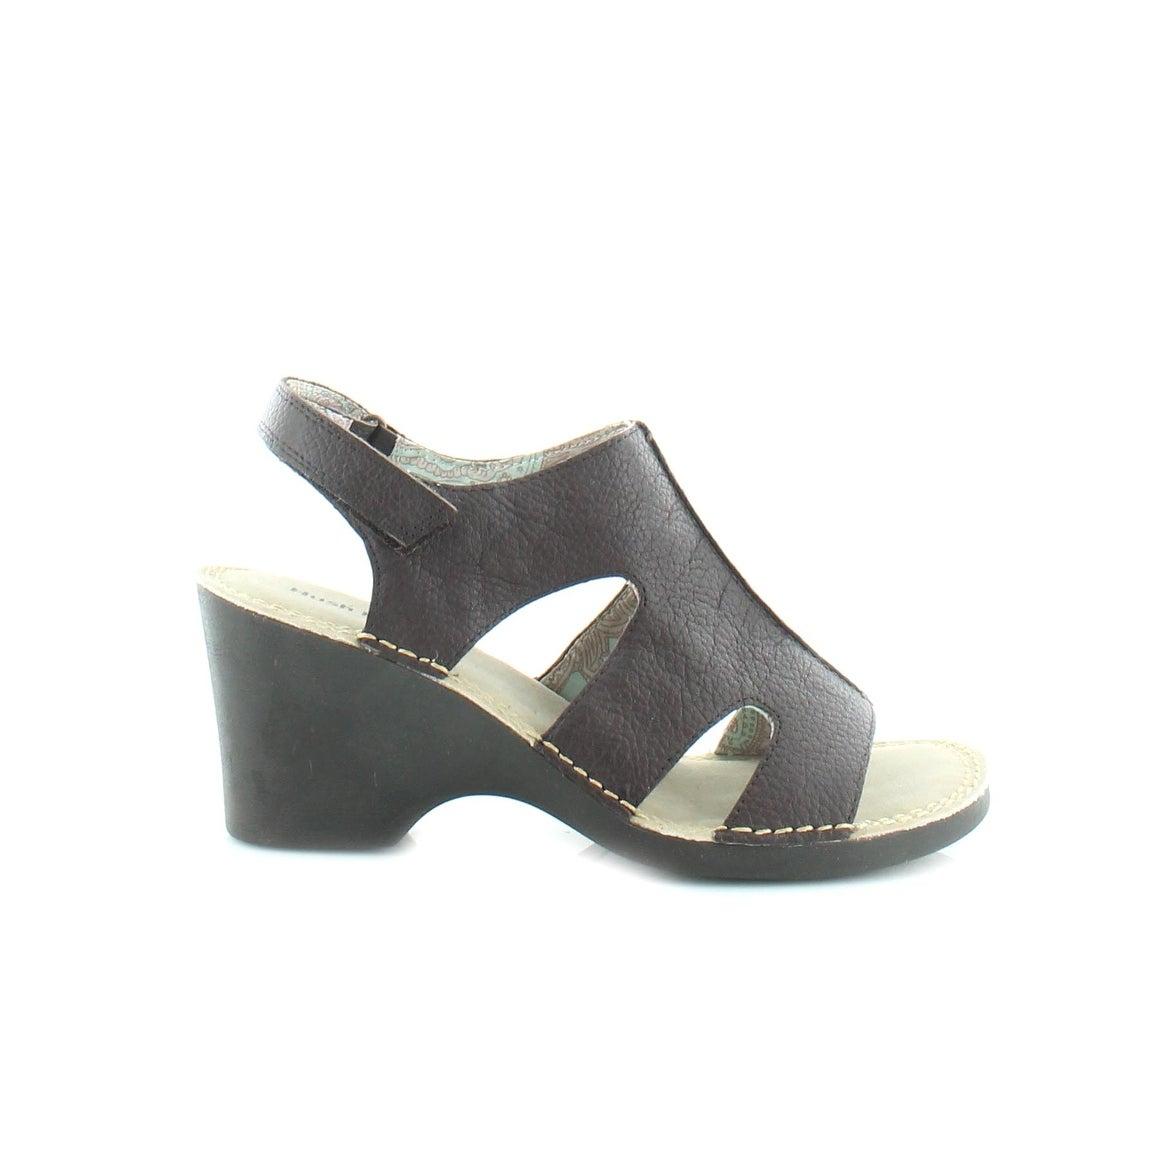 e7d0ffef26c5bd Shop Hush Puppies Julie Havana IIV Women s Sandals   Flip Flops Deep Brown  - Free Shipping On Orders Over  45 - Overstock.com - 18293855